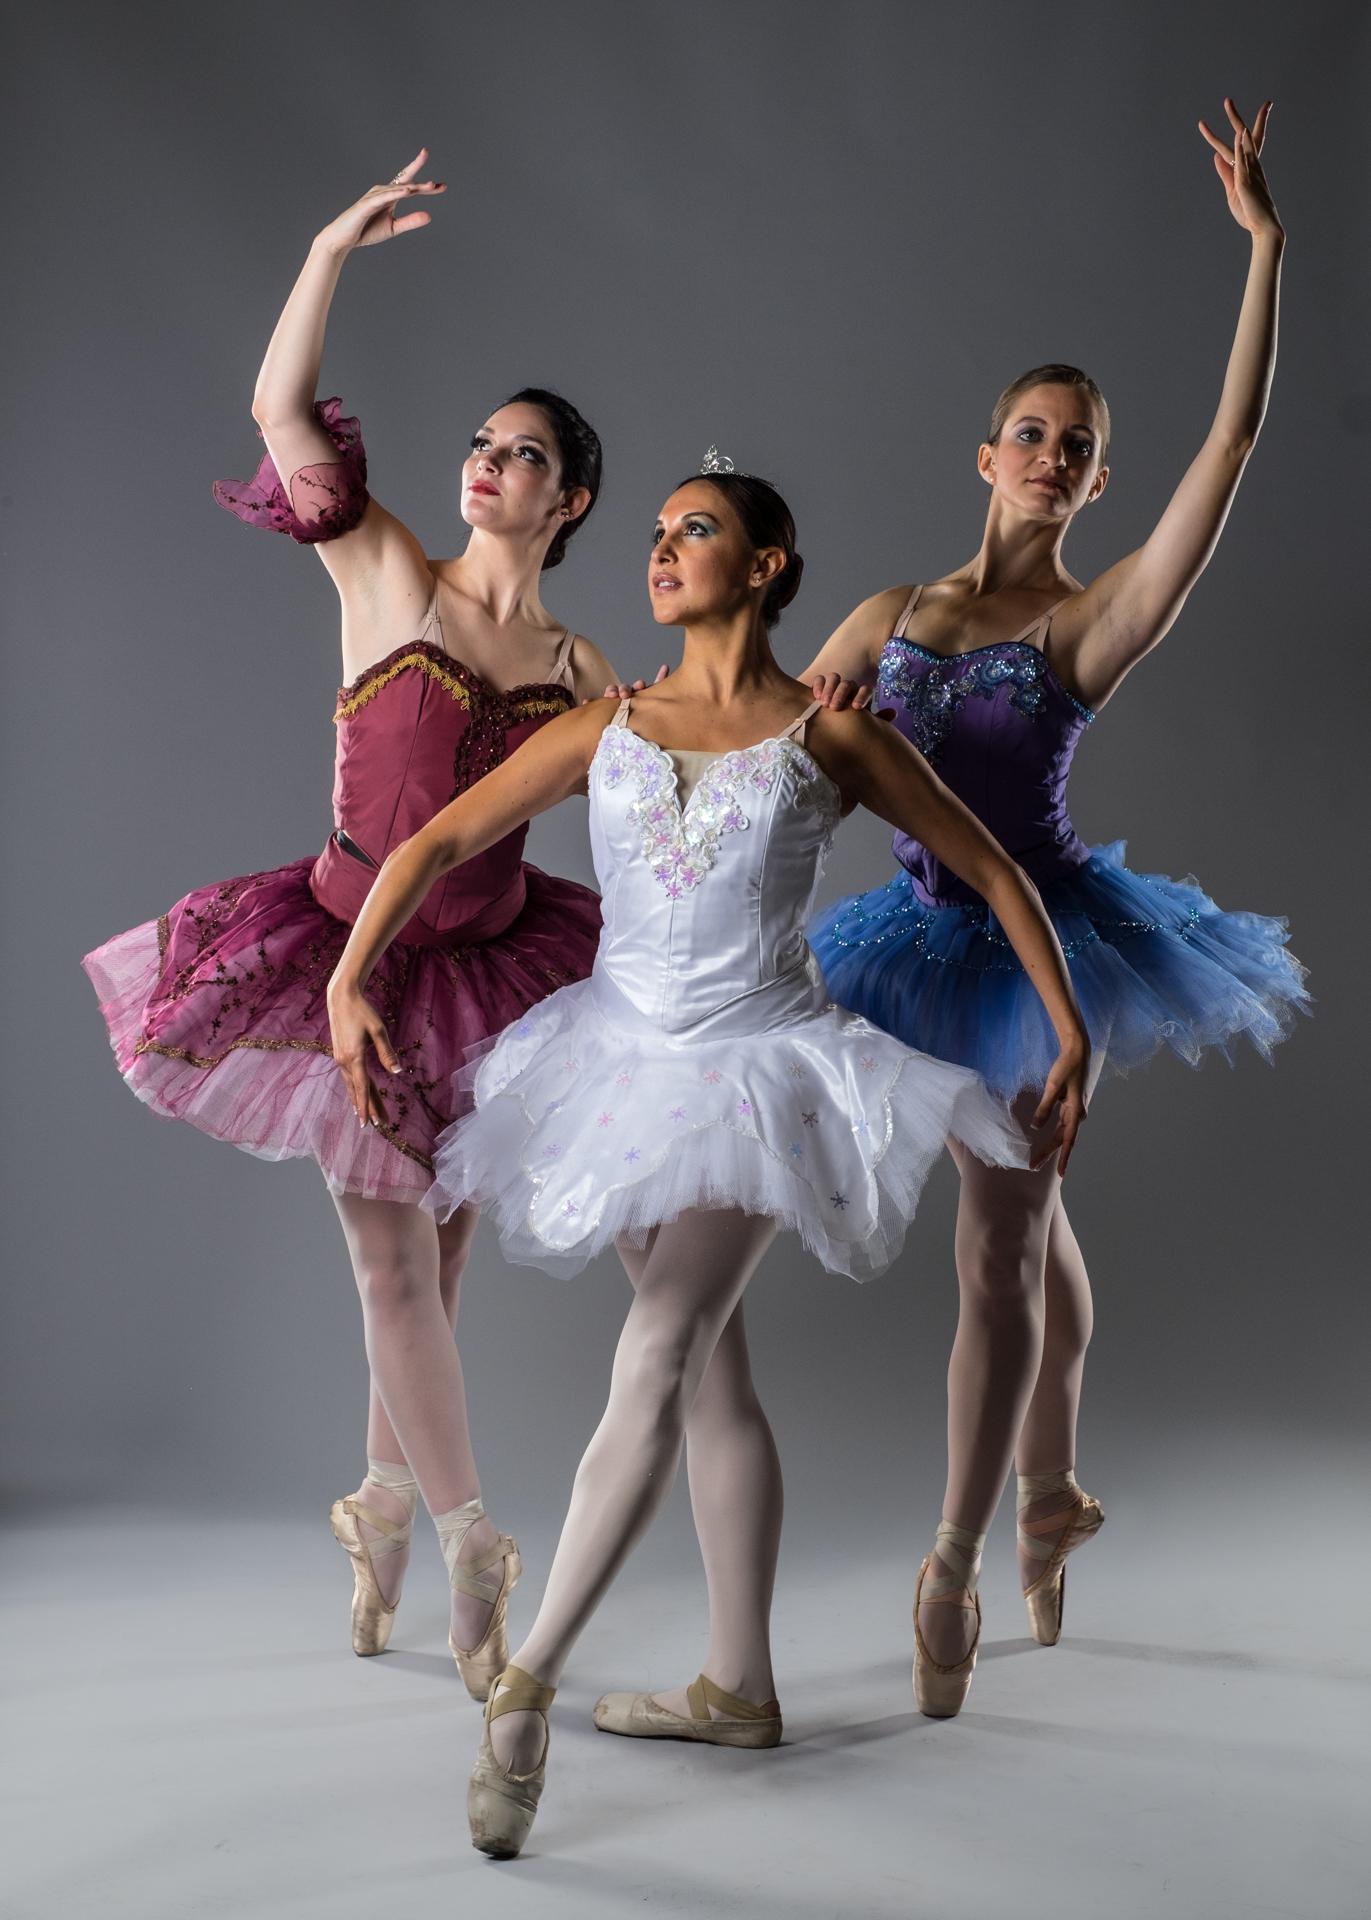 Ballerinas X T1 And Phottix Indra Lights Fujilove